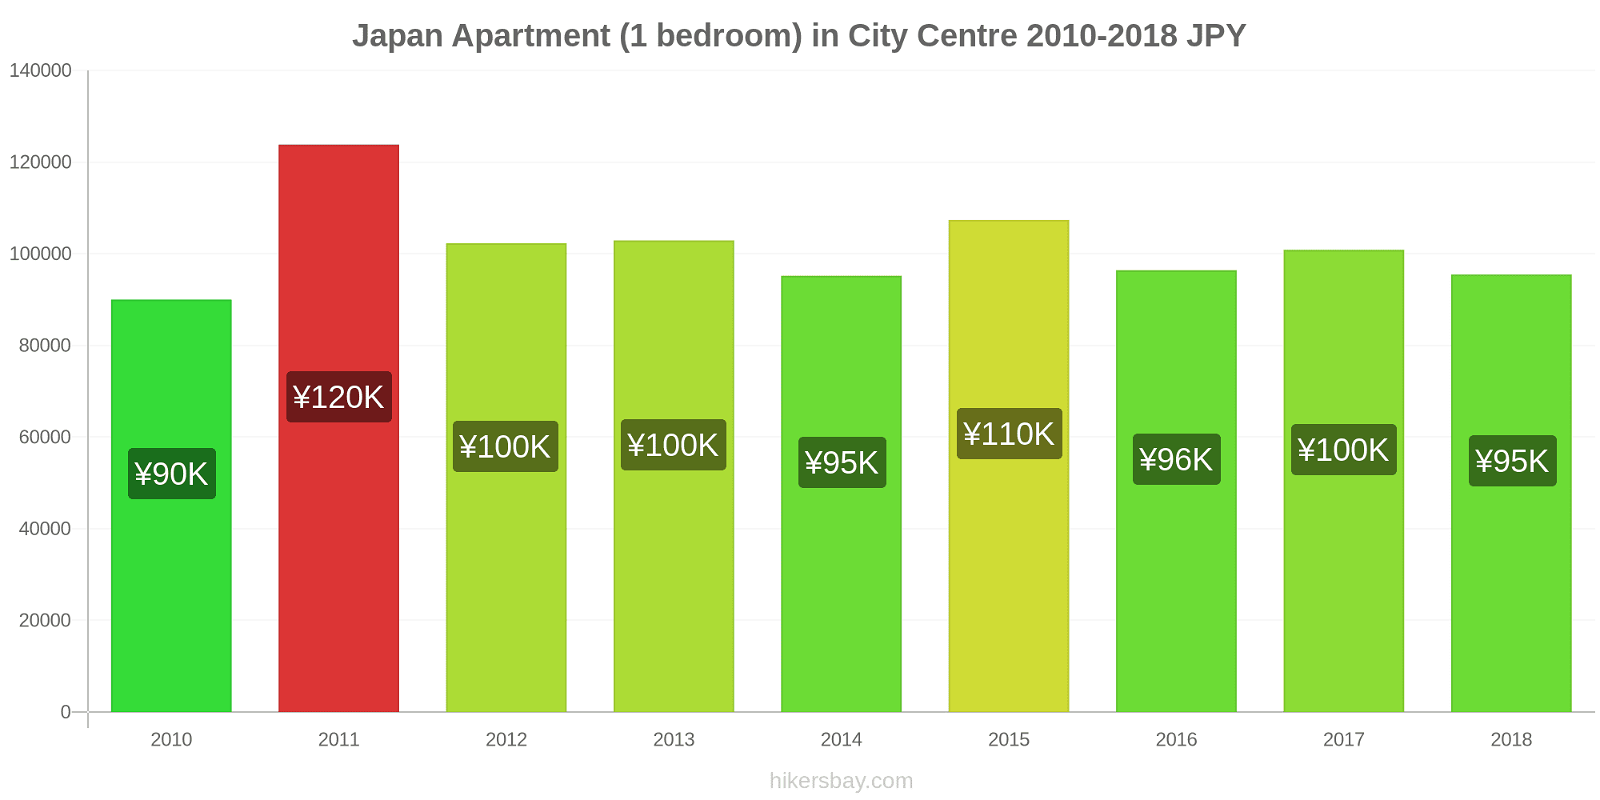 Japan price changes Apartment (1 bedroom) in City Centre hikersbay.com